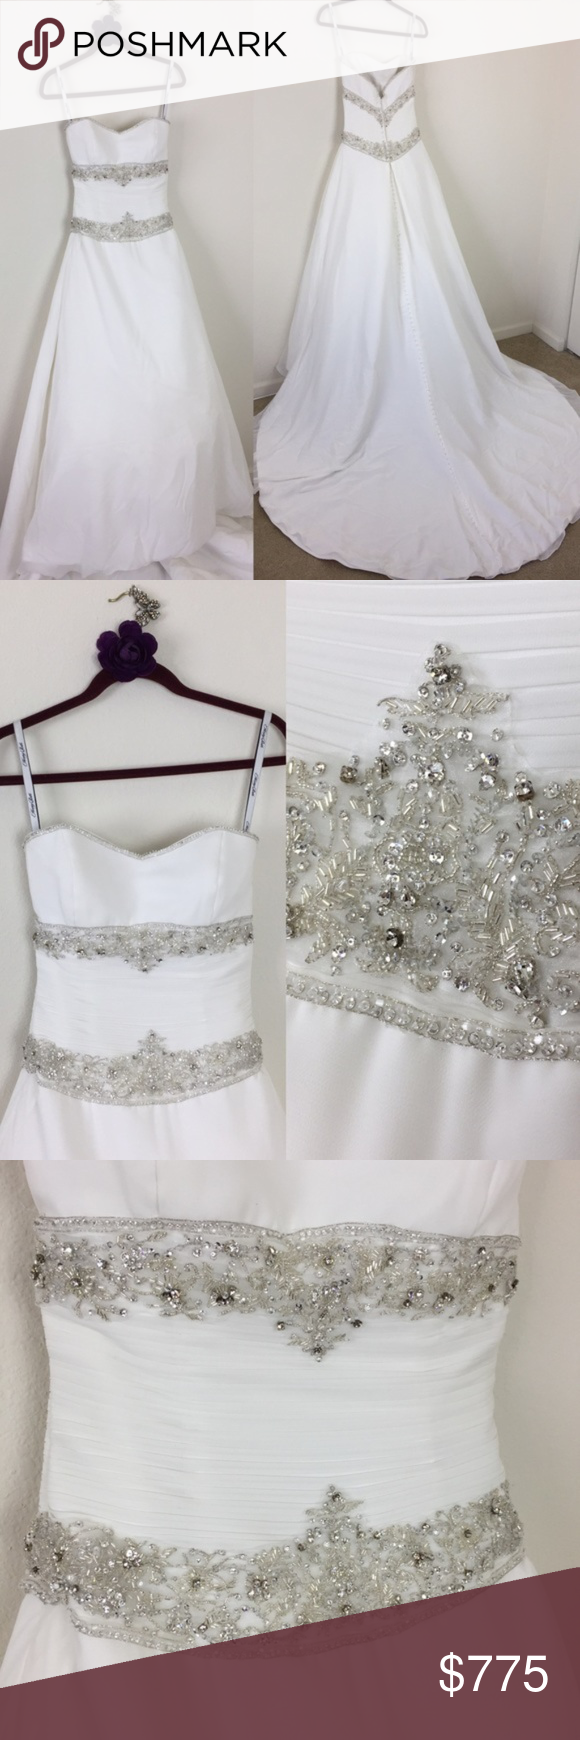 Betsey johnson wedding dresses  Henry Roth Kleinfeld Rhinestone Wedding Gown  Henry roth Beaded